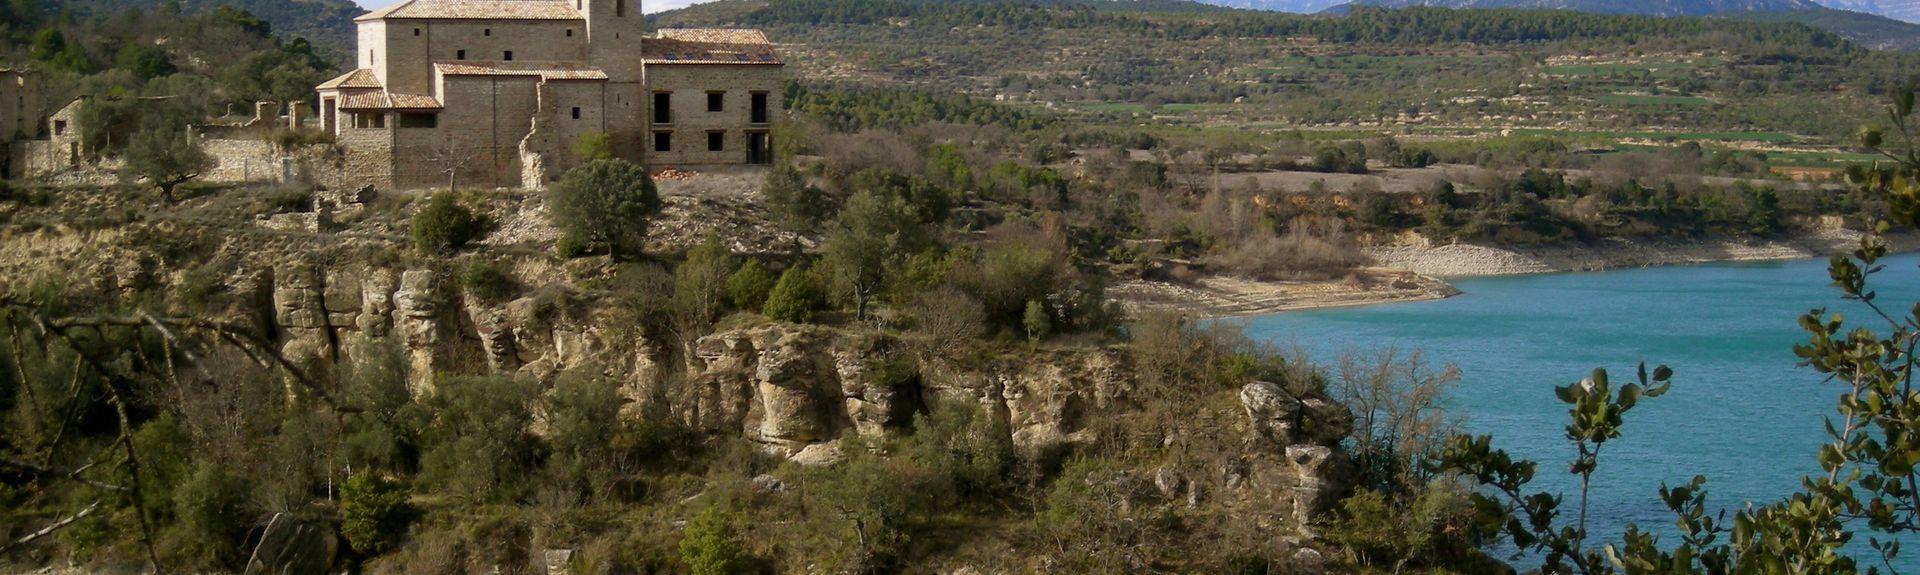 Ribagorza / Ribagorça, Huesca, Spain